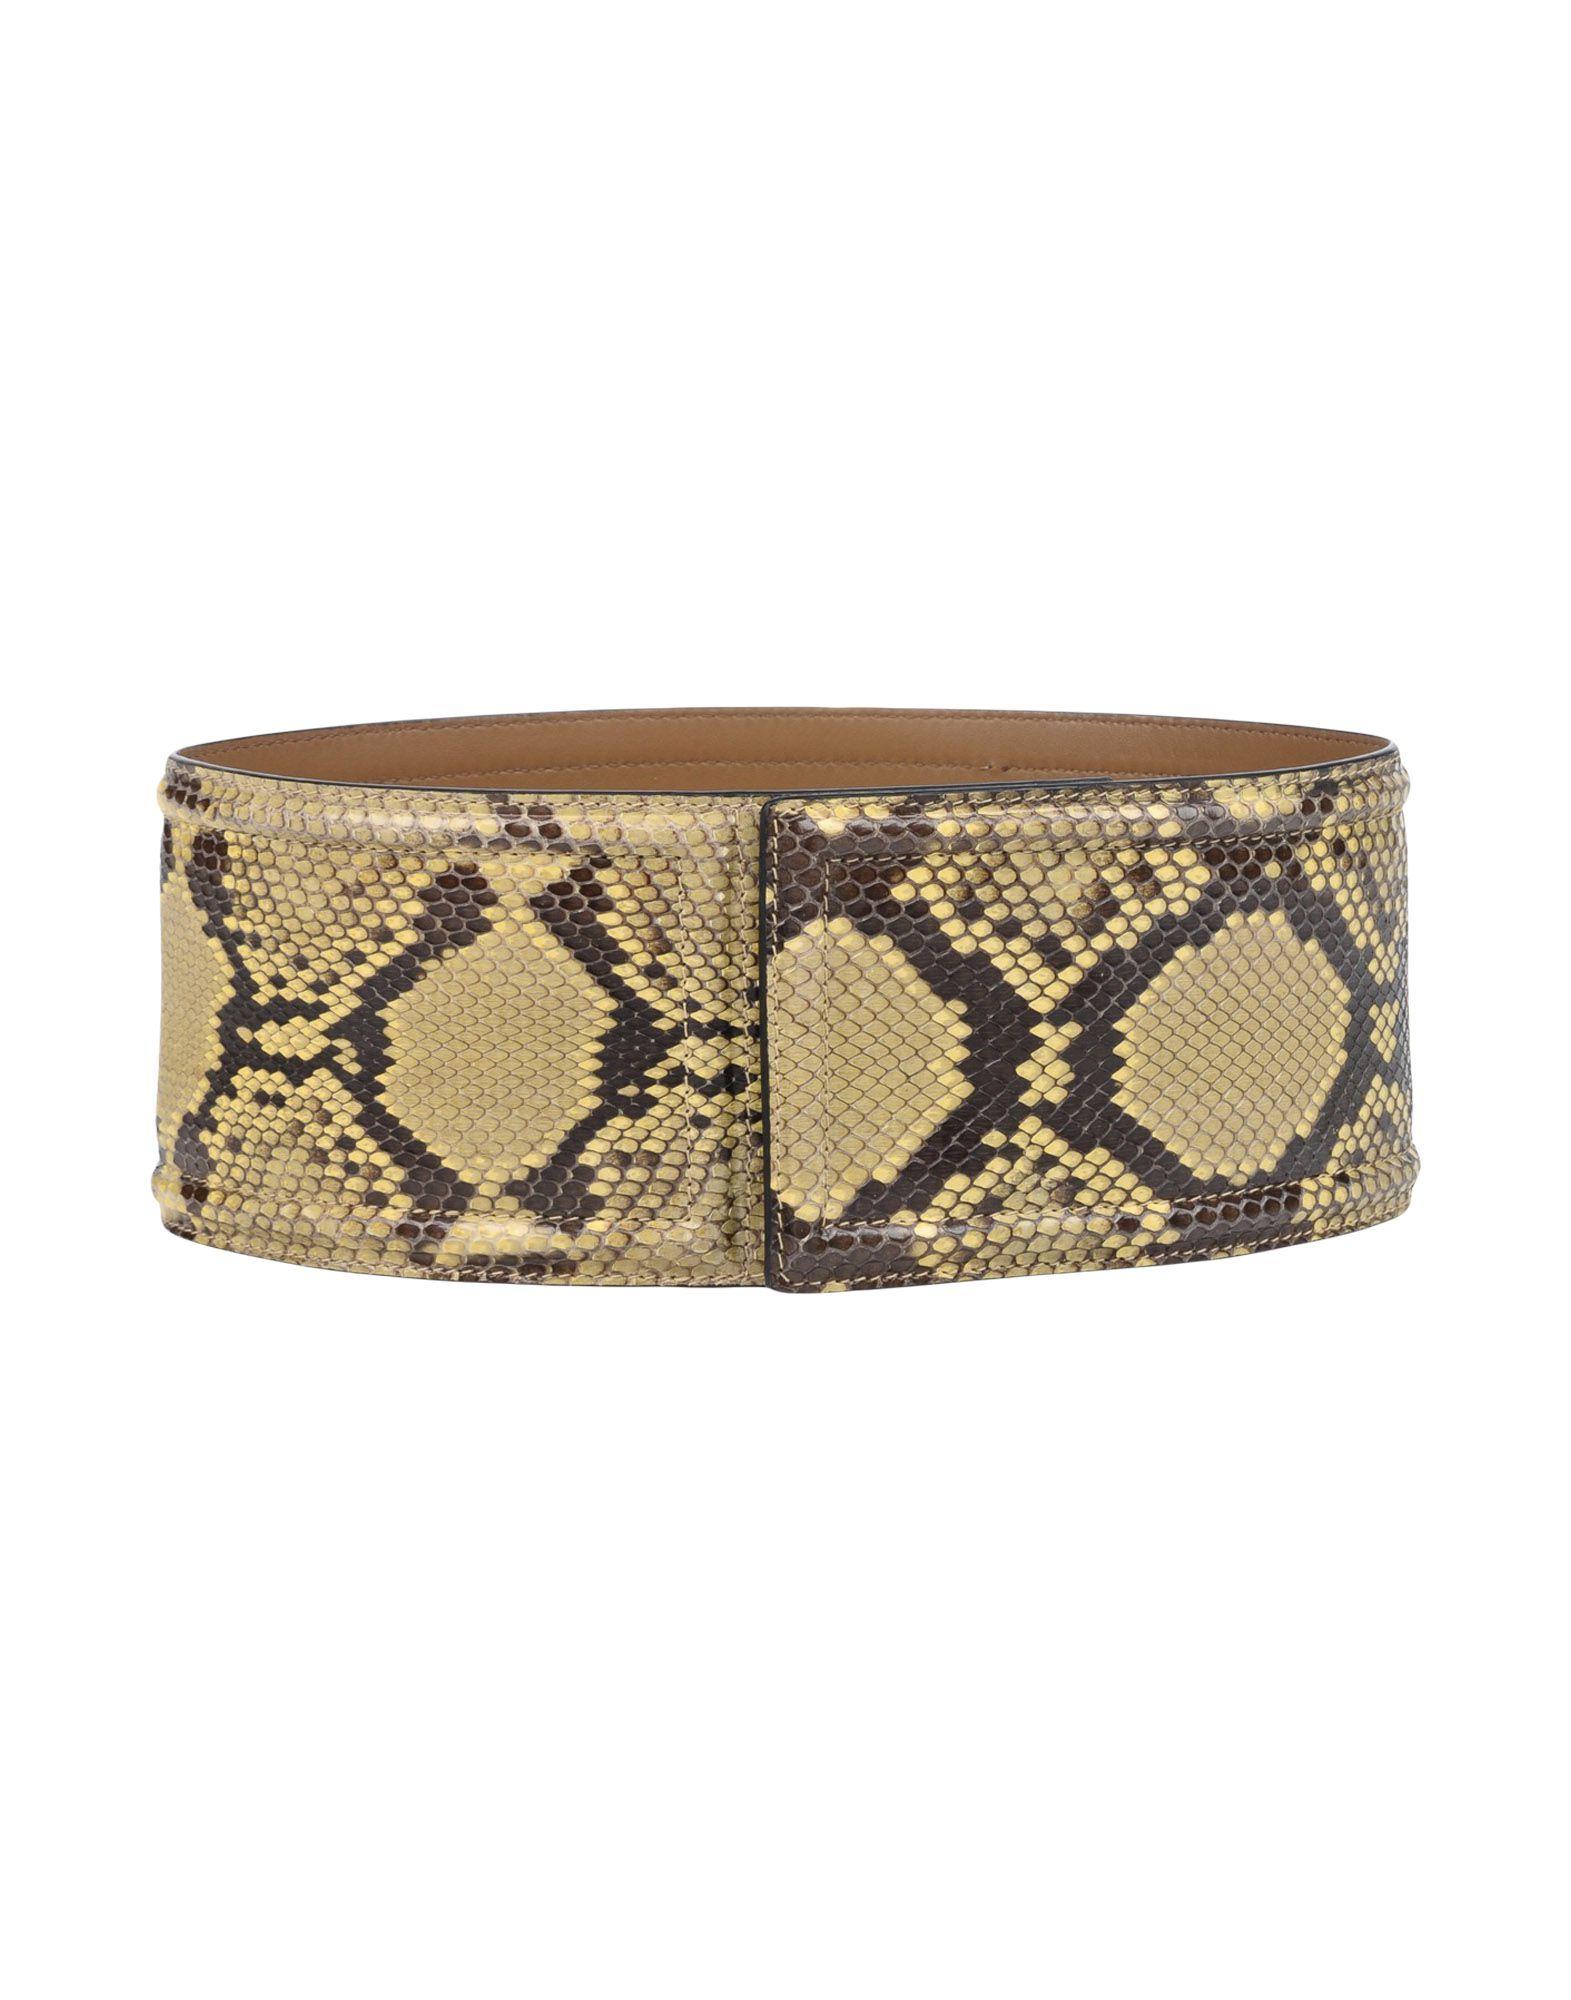 su online Cintura Marni Alta Acquista Donna 1w77YTqX